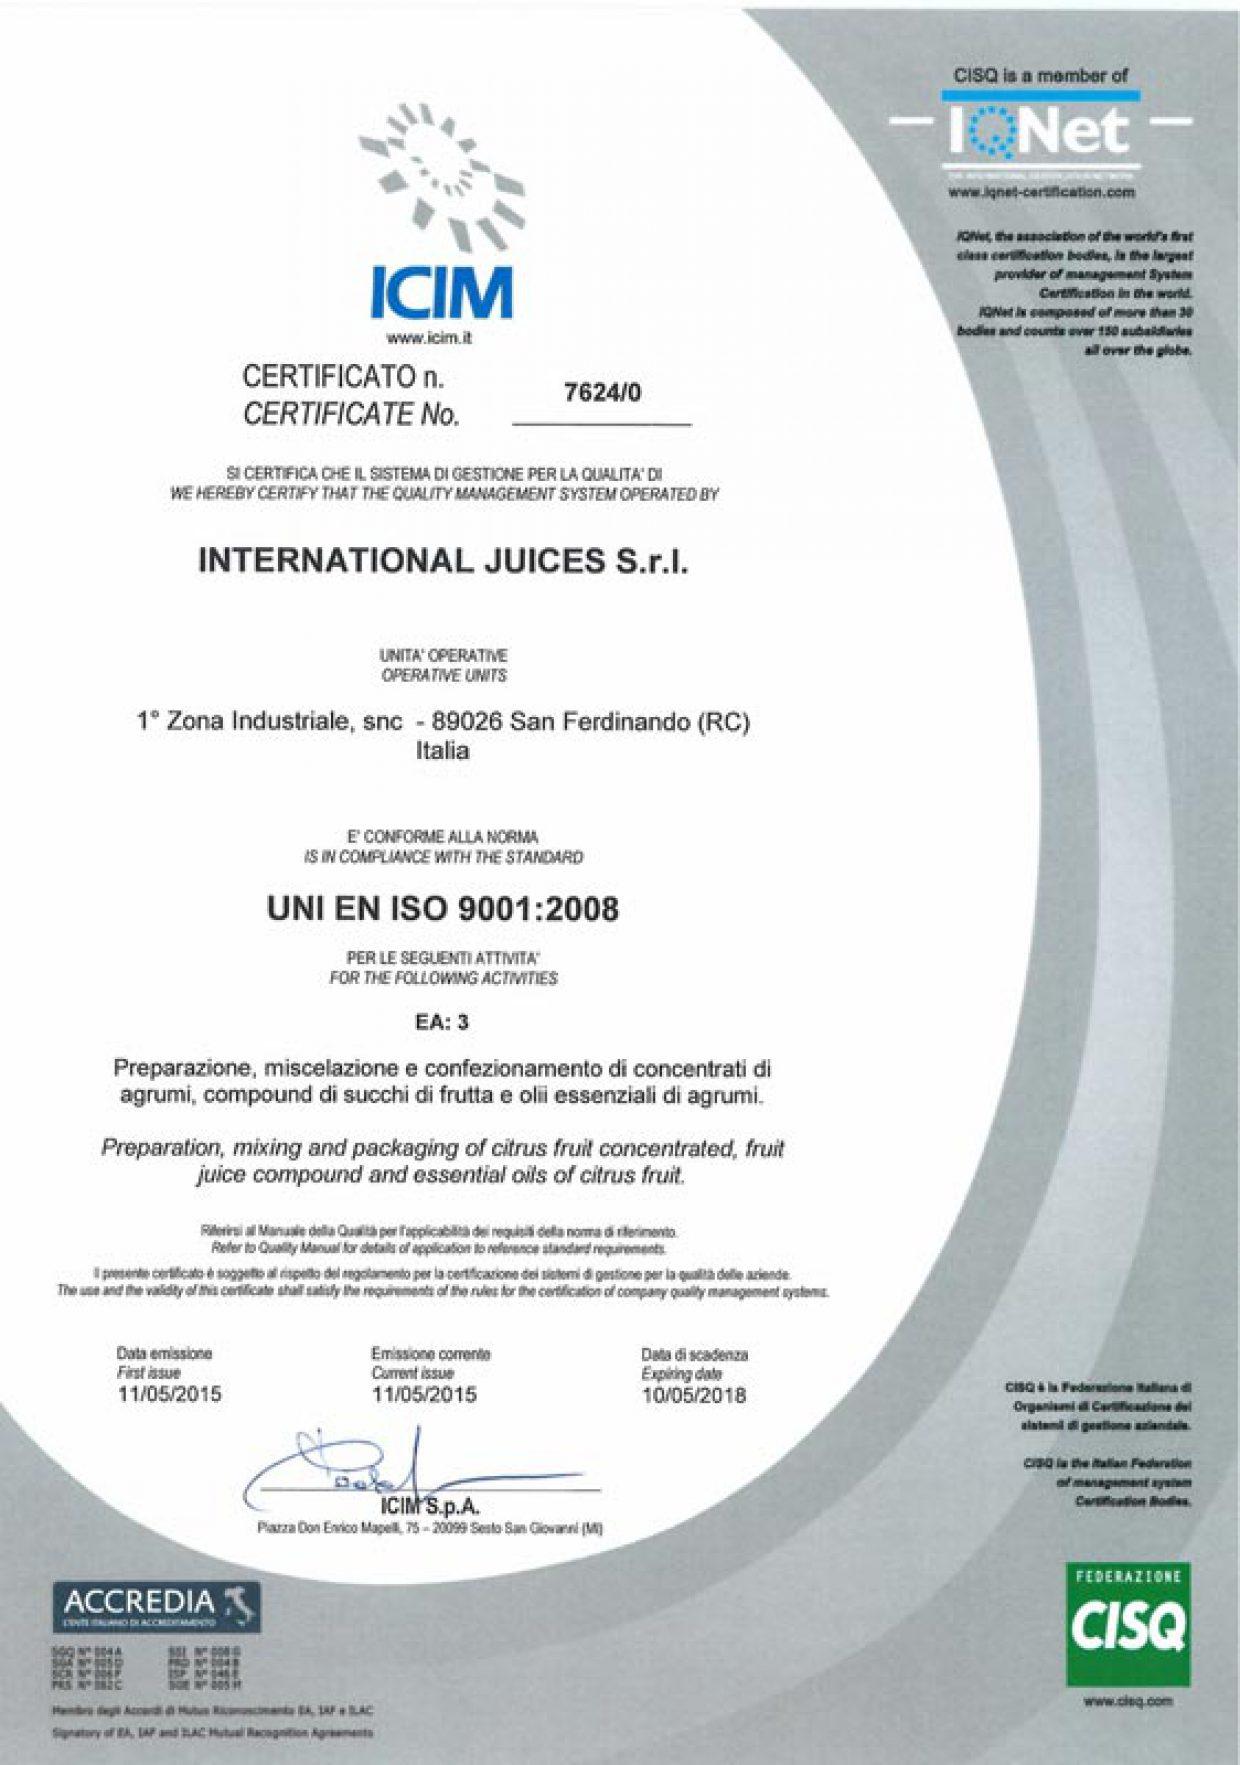 Certificazione ICIM UNI EN ISO 9001:2008